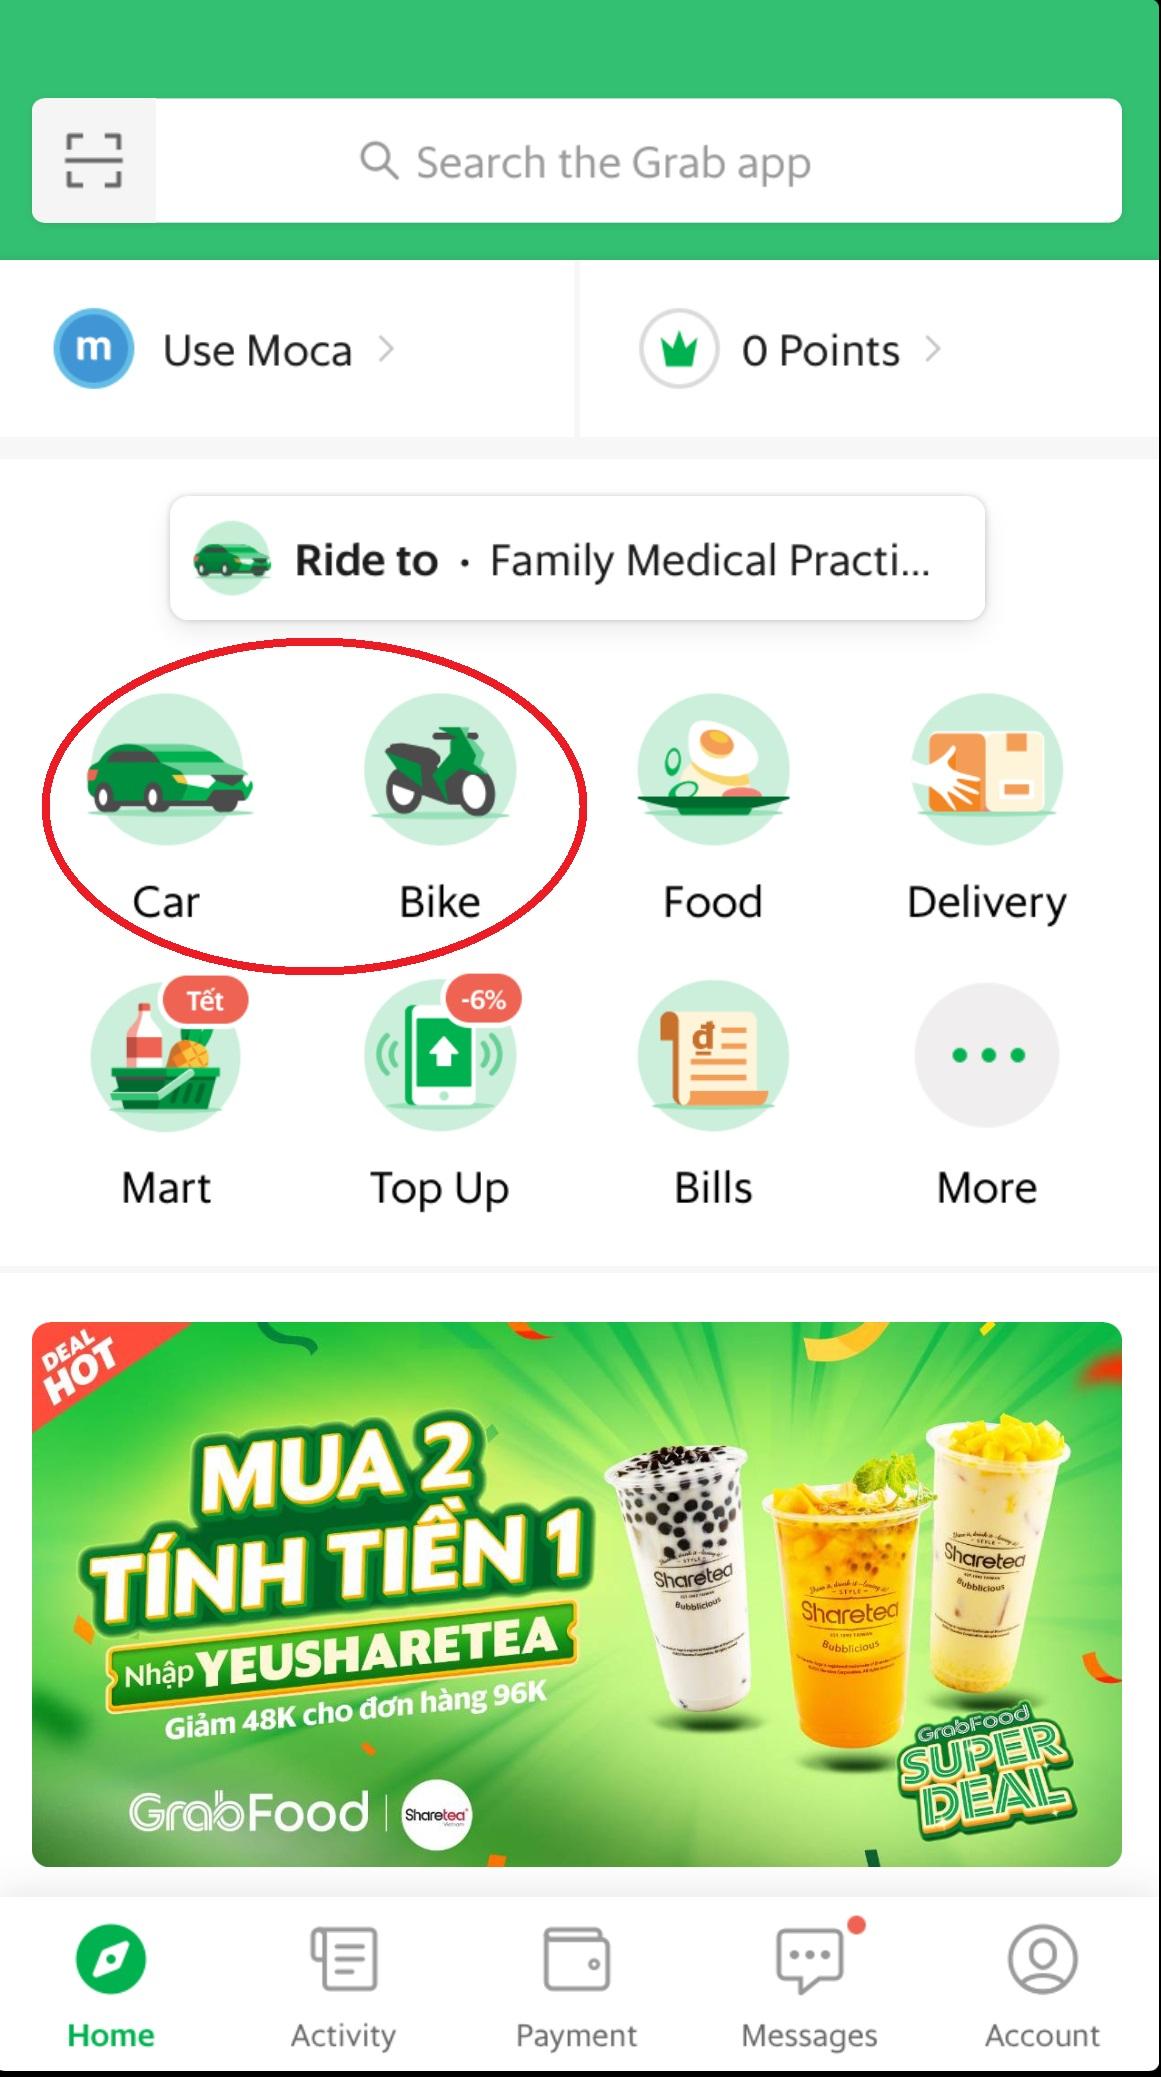 Grab_タクシー_メイン画面